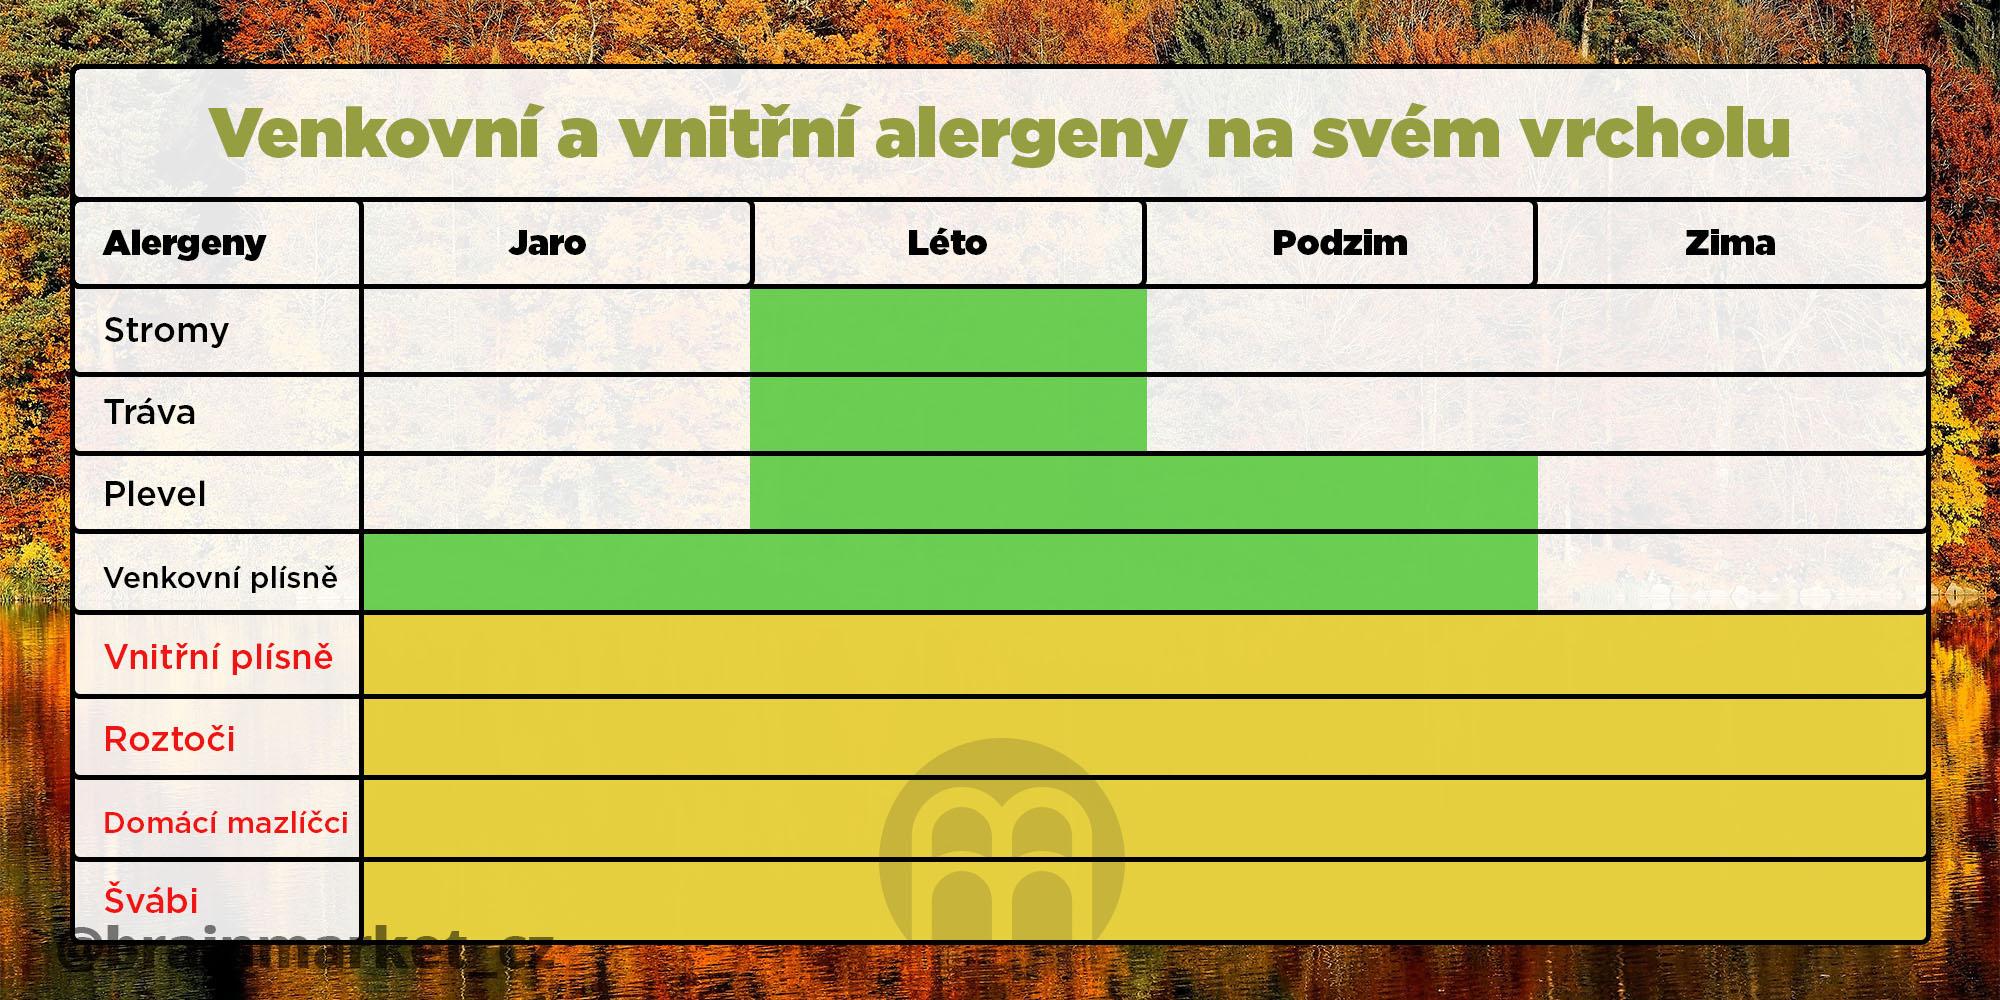 venkovni-a-vnitrni-alergeny-na-svem-vrcholu-infografika-brainmarket-cz